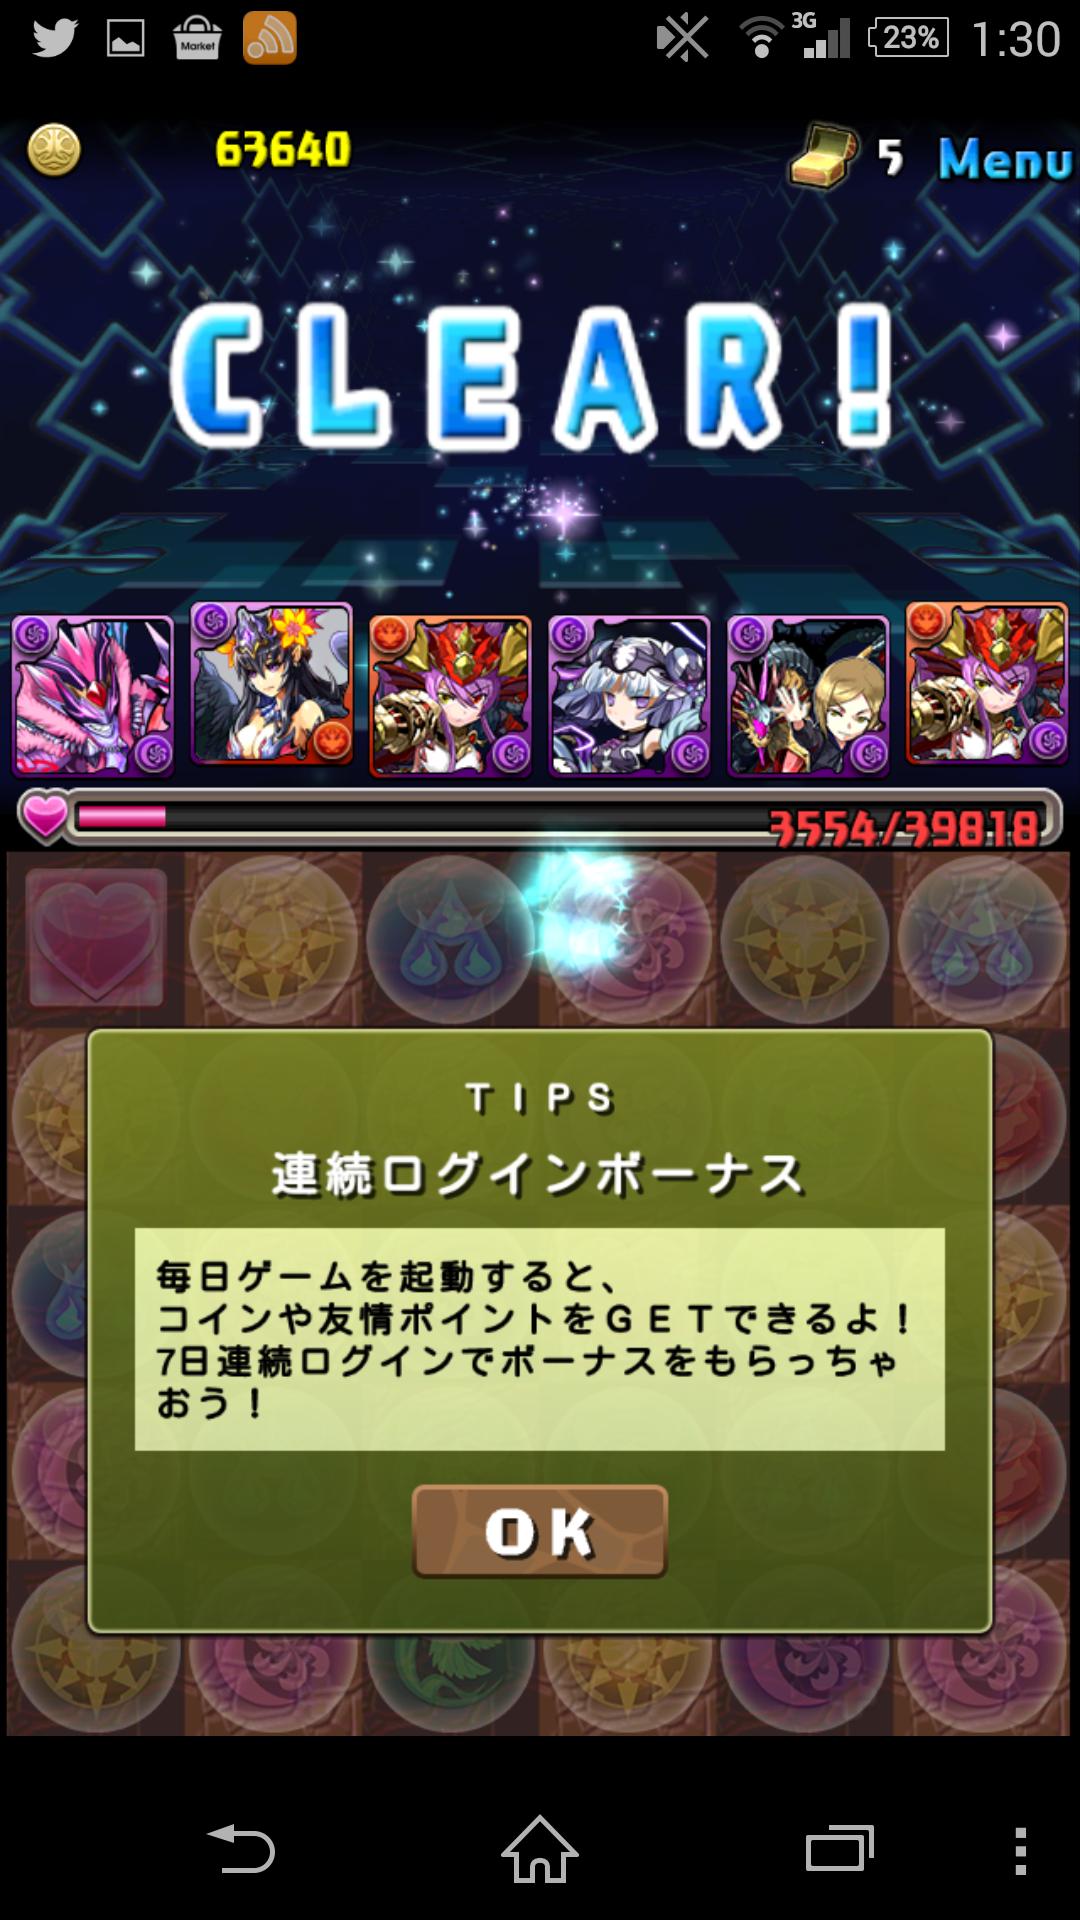 Screenshot_2014-12-19-01-30-14.png